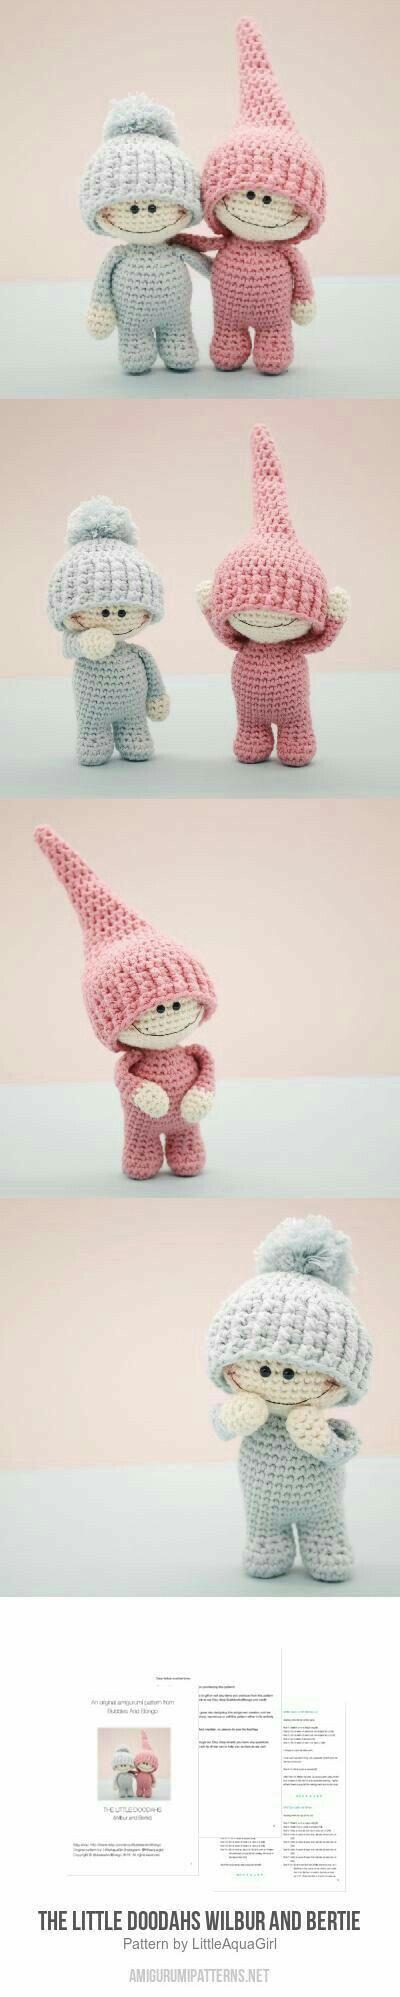 Funny toys crochet free pattern #ayuob #crochet